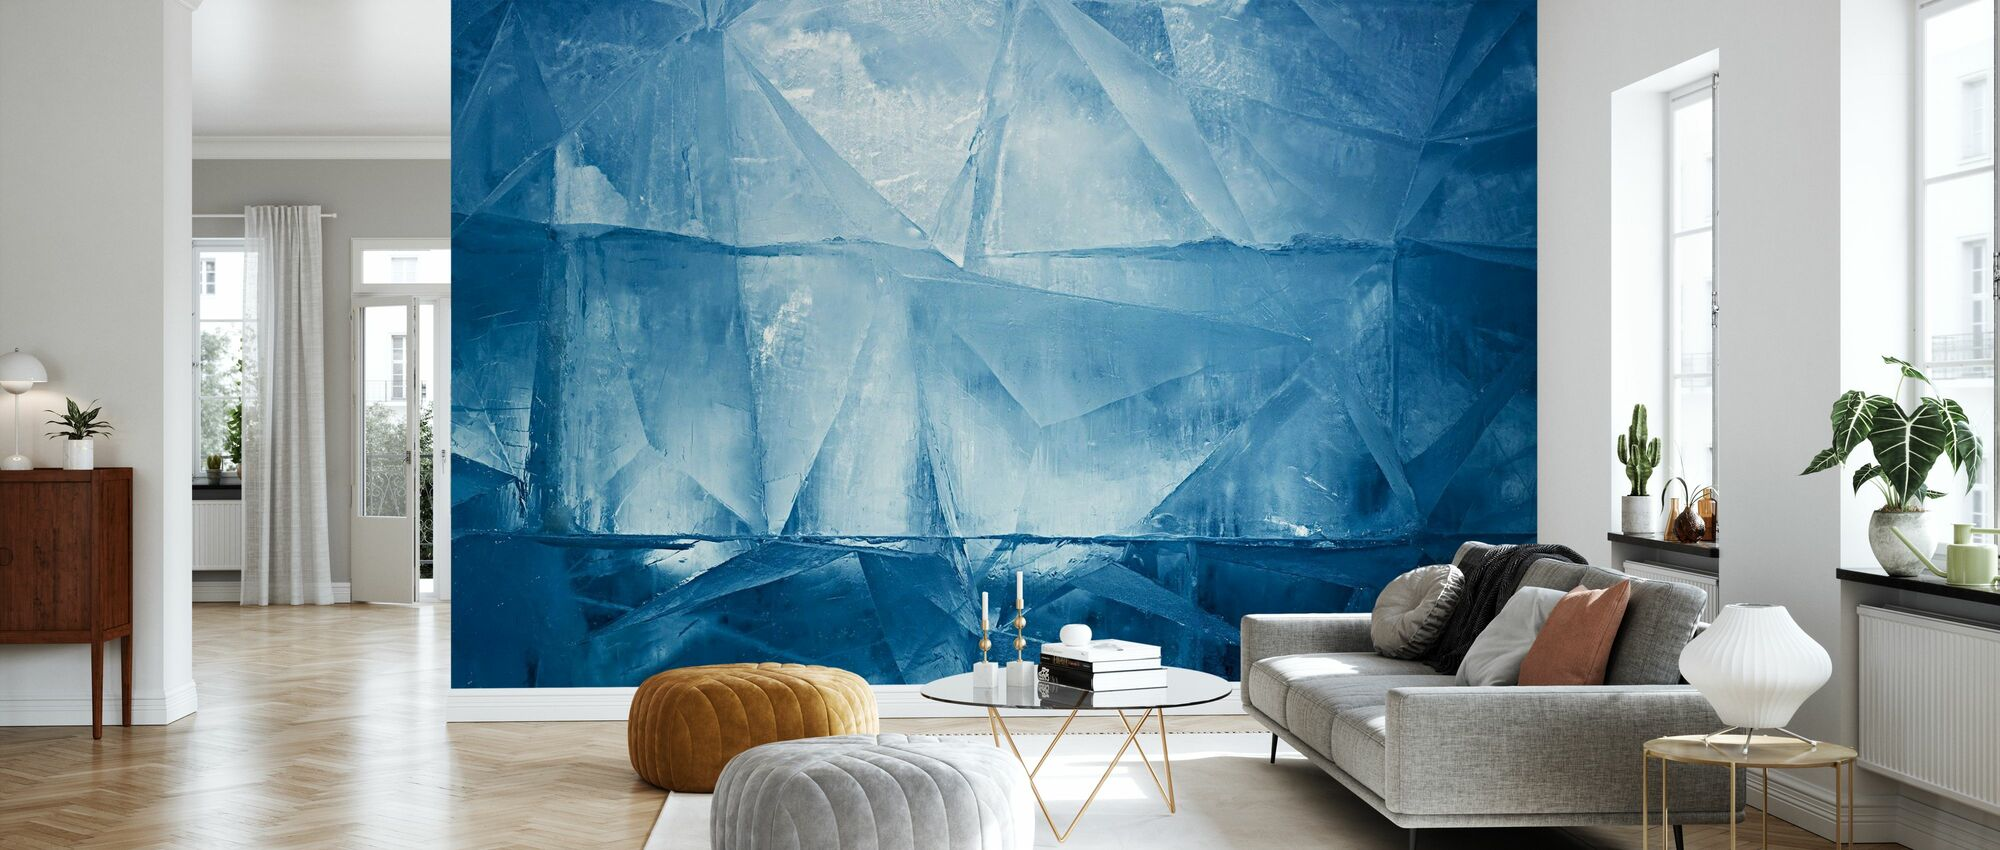 Blue Ice - Wallpaper - Living Room